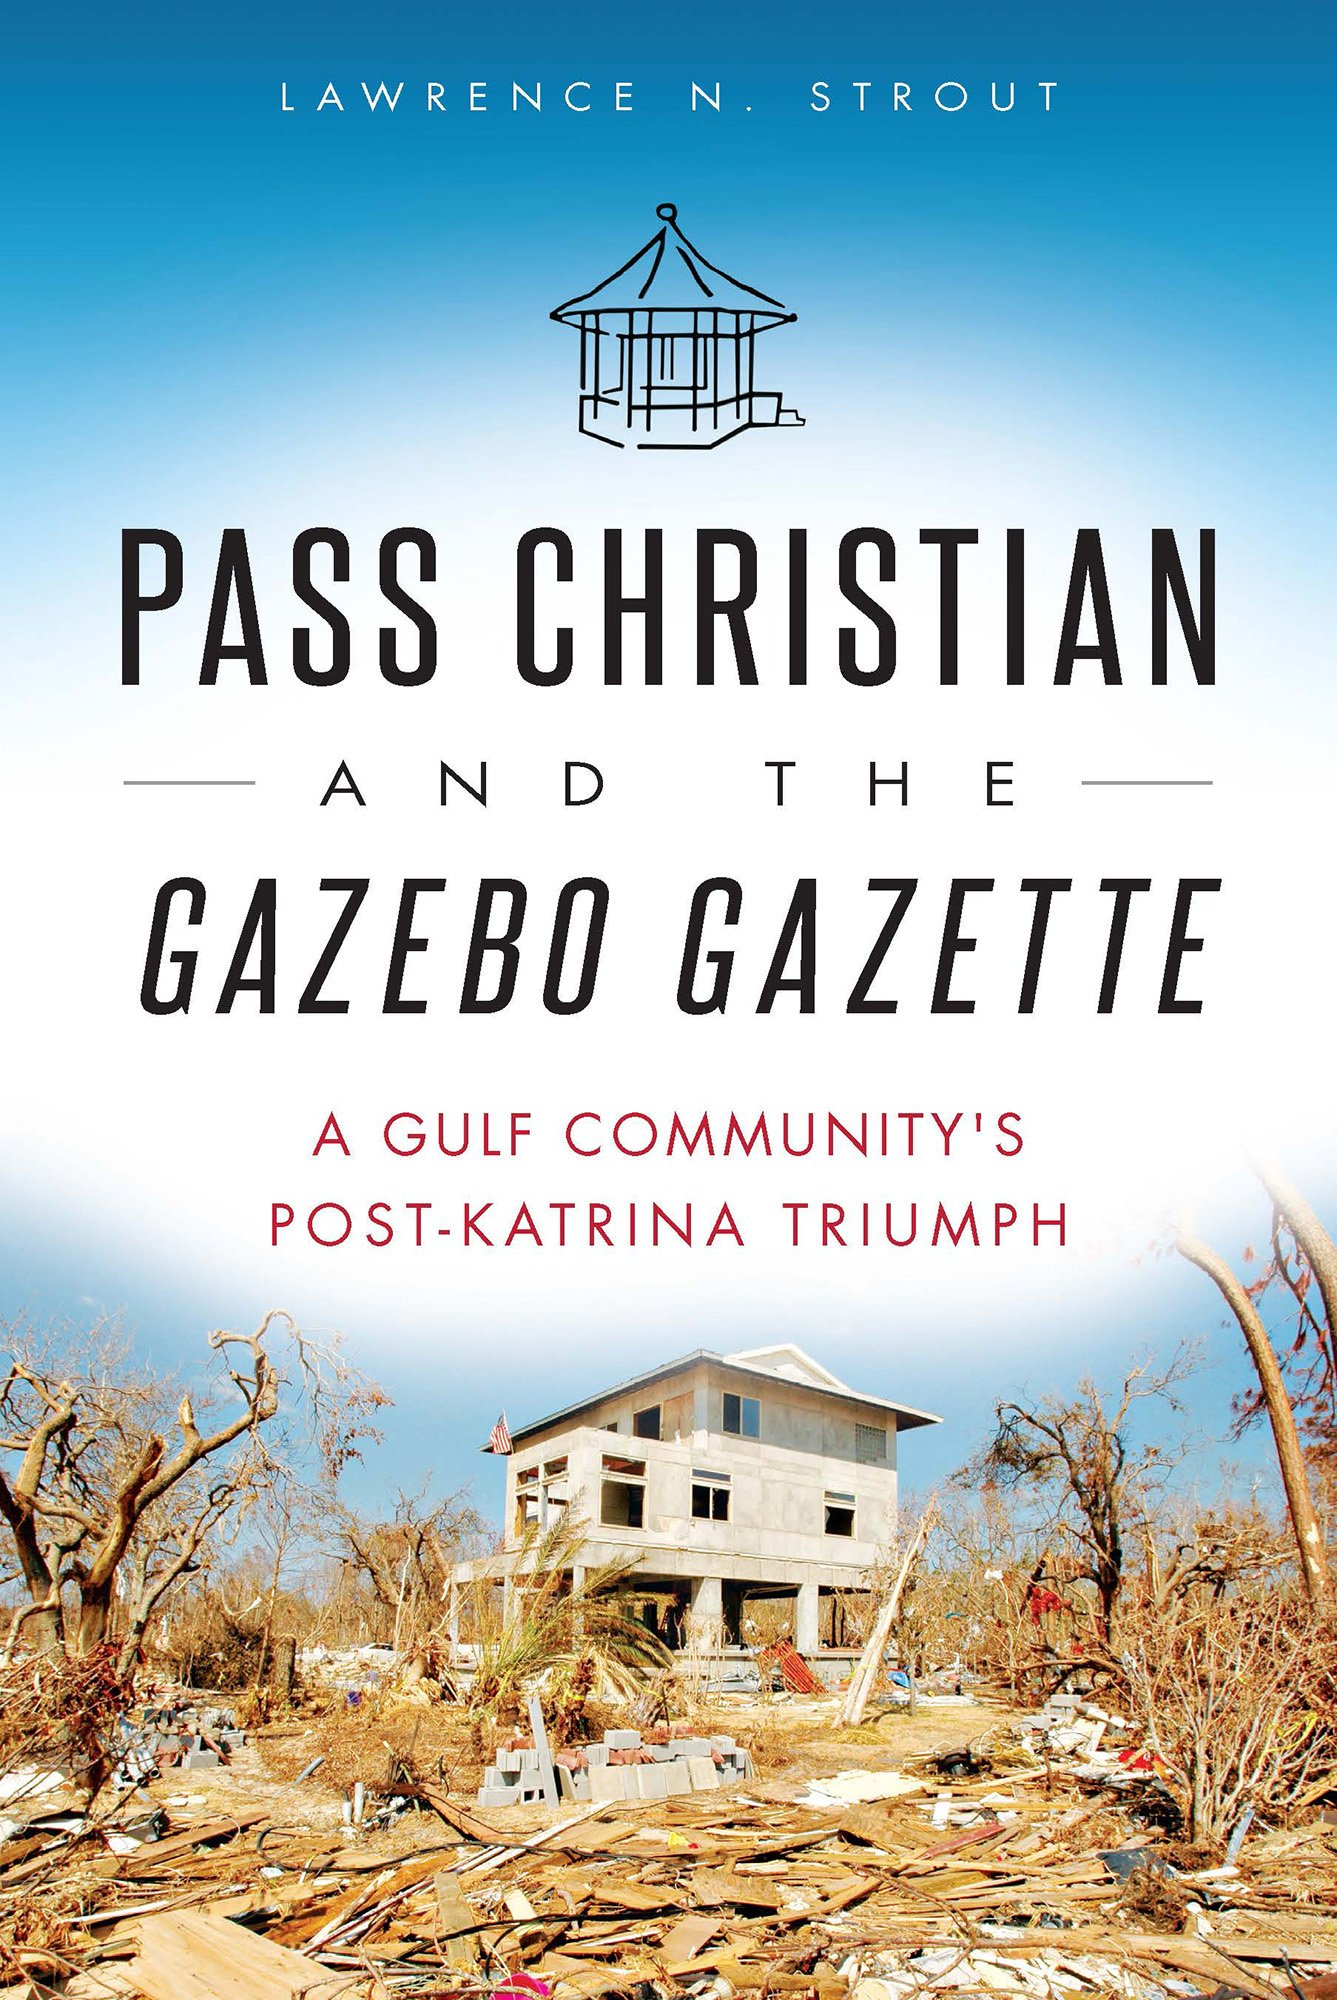 pass-christian-and-the-gazebo-gazette-a-gulf-community-s-post-katrina-triumph